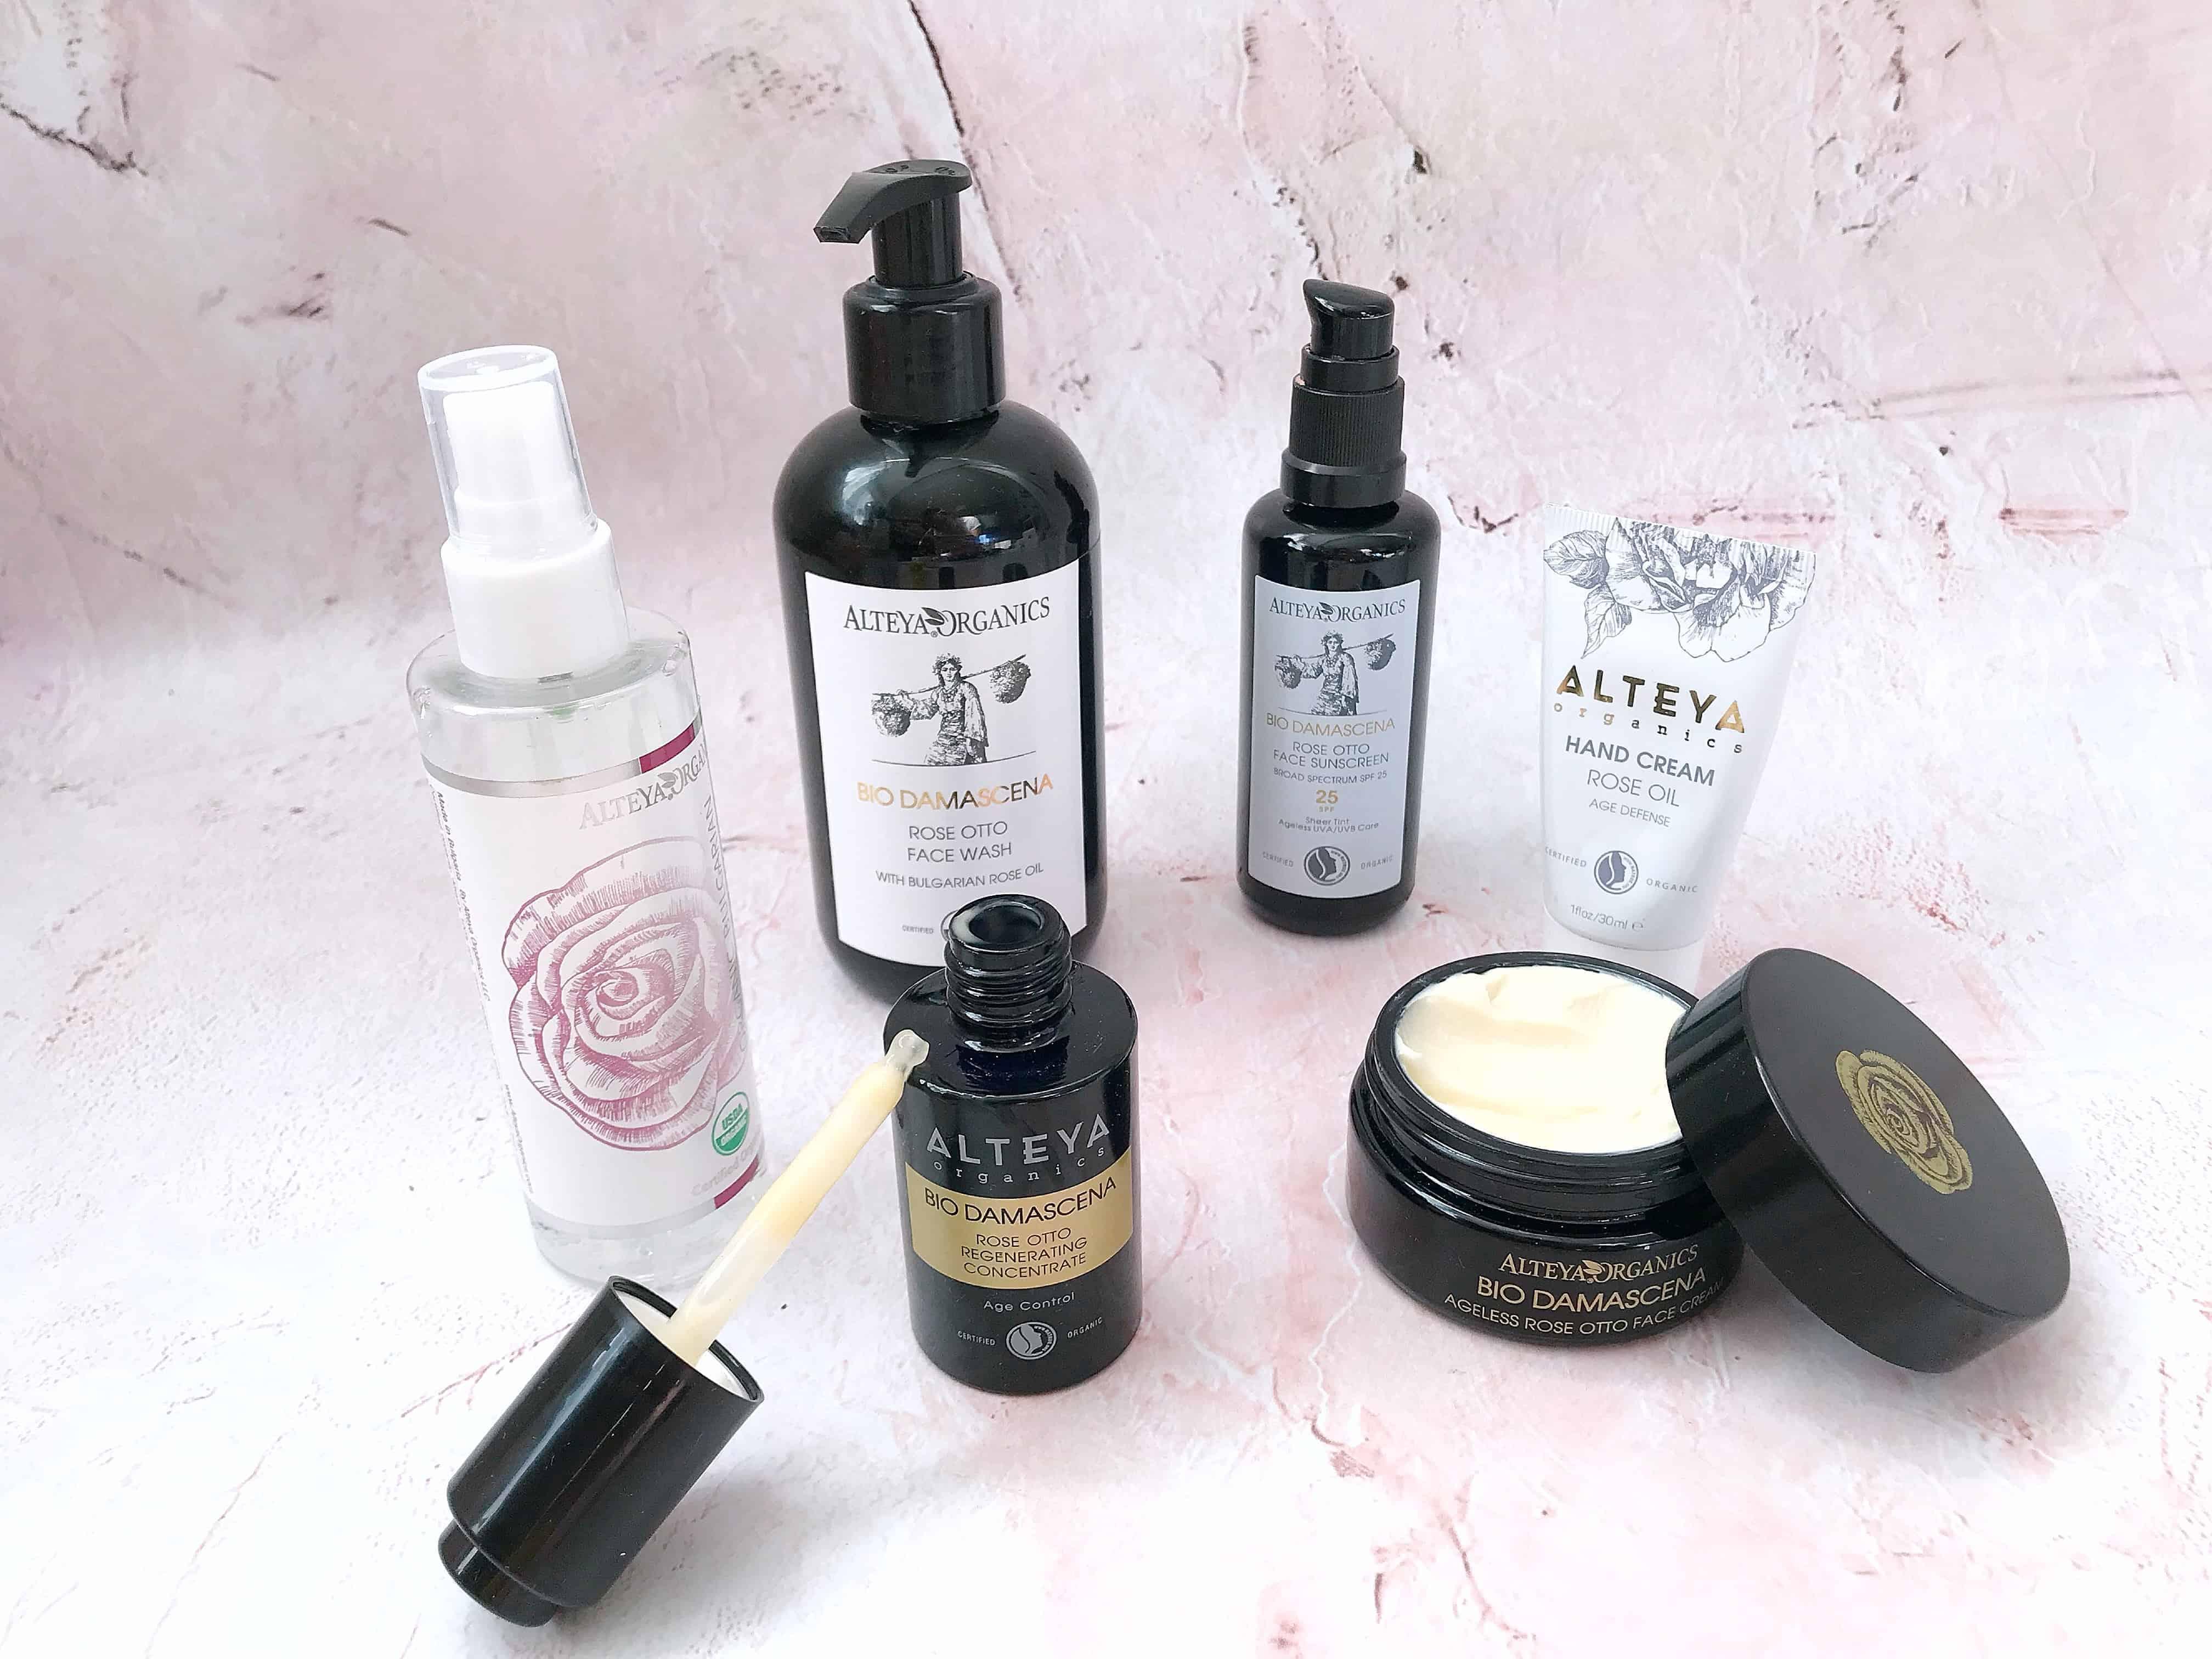 Natural Brand Focus Alteya Organics Skin Care